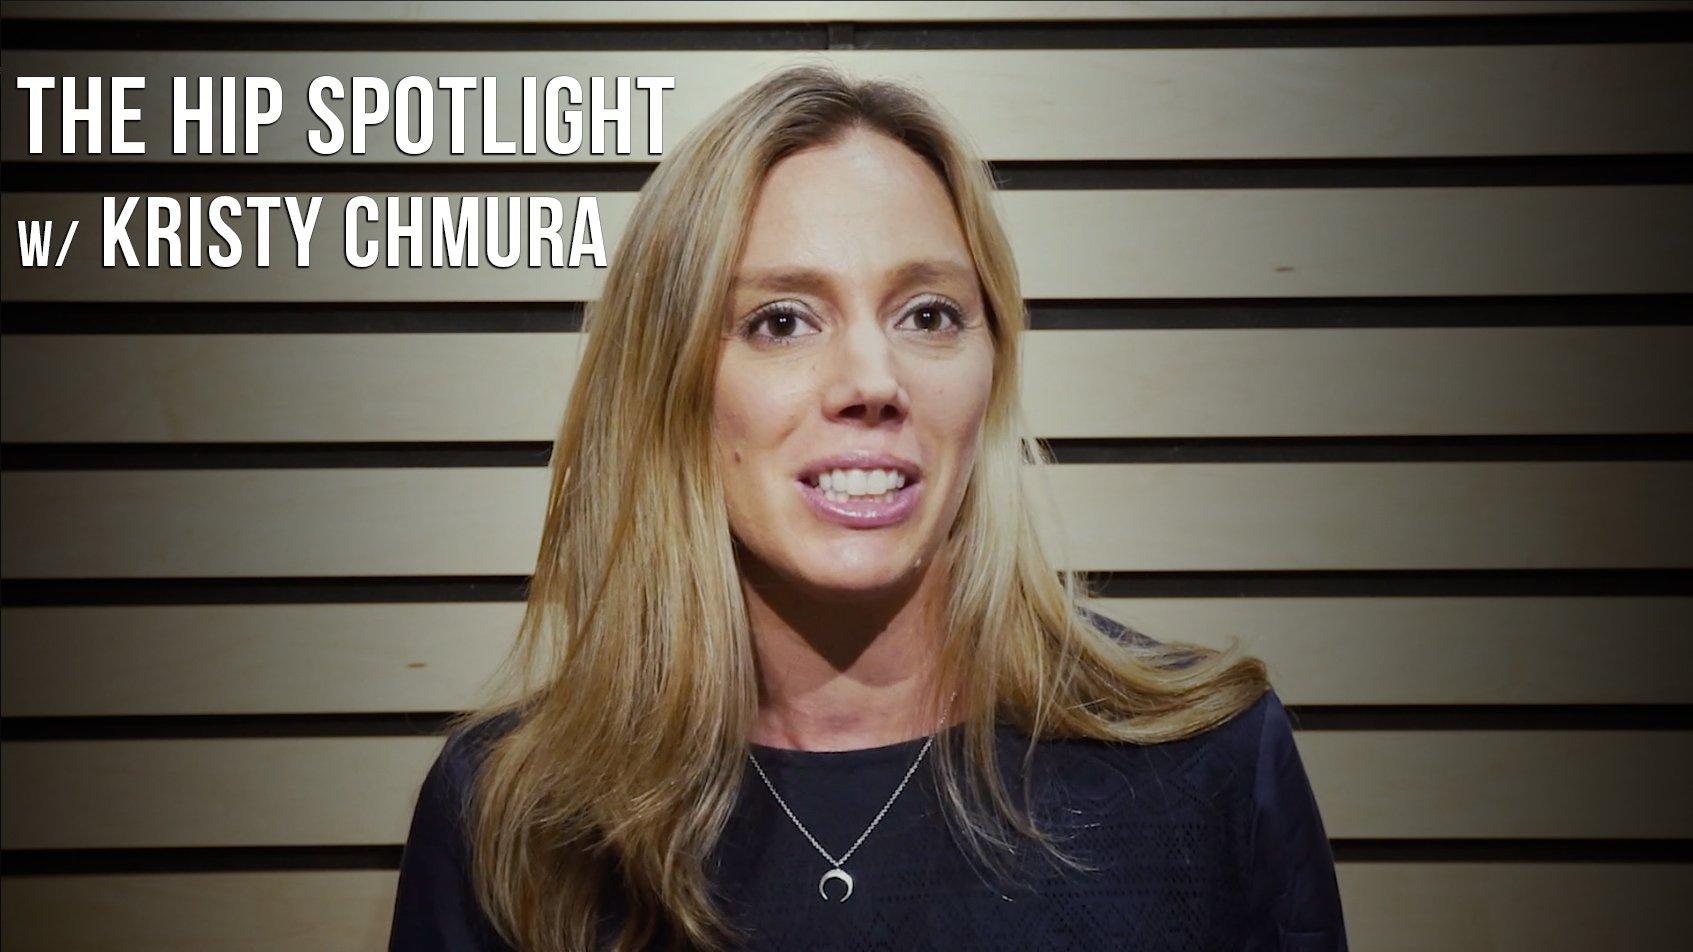 Kristy Chmura